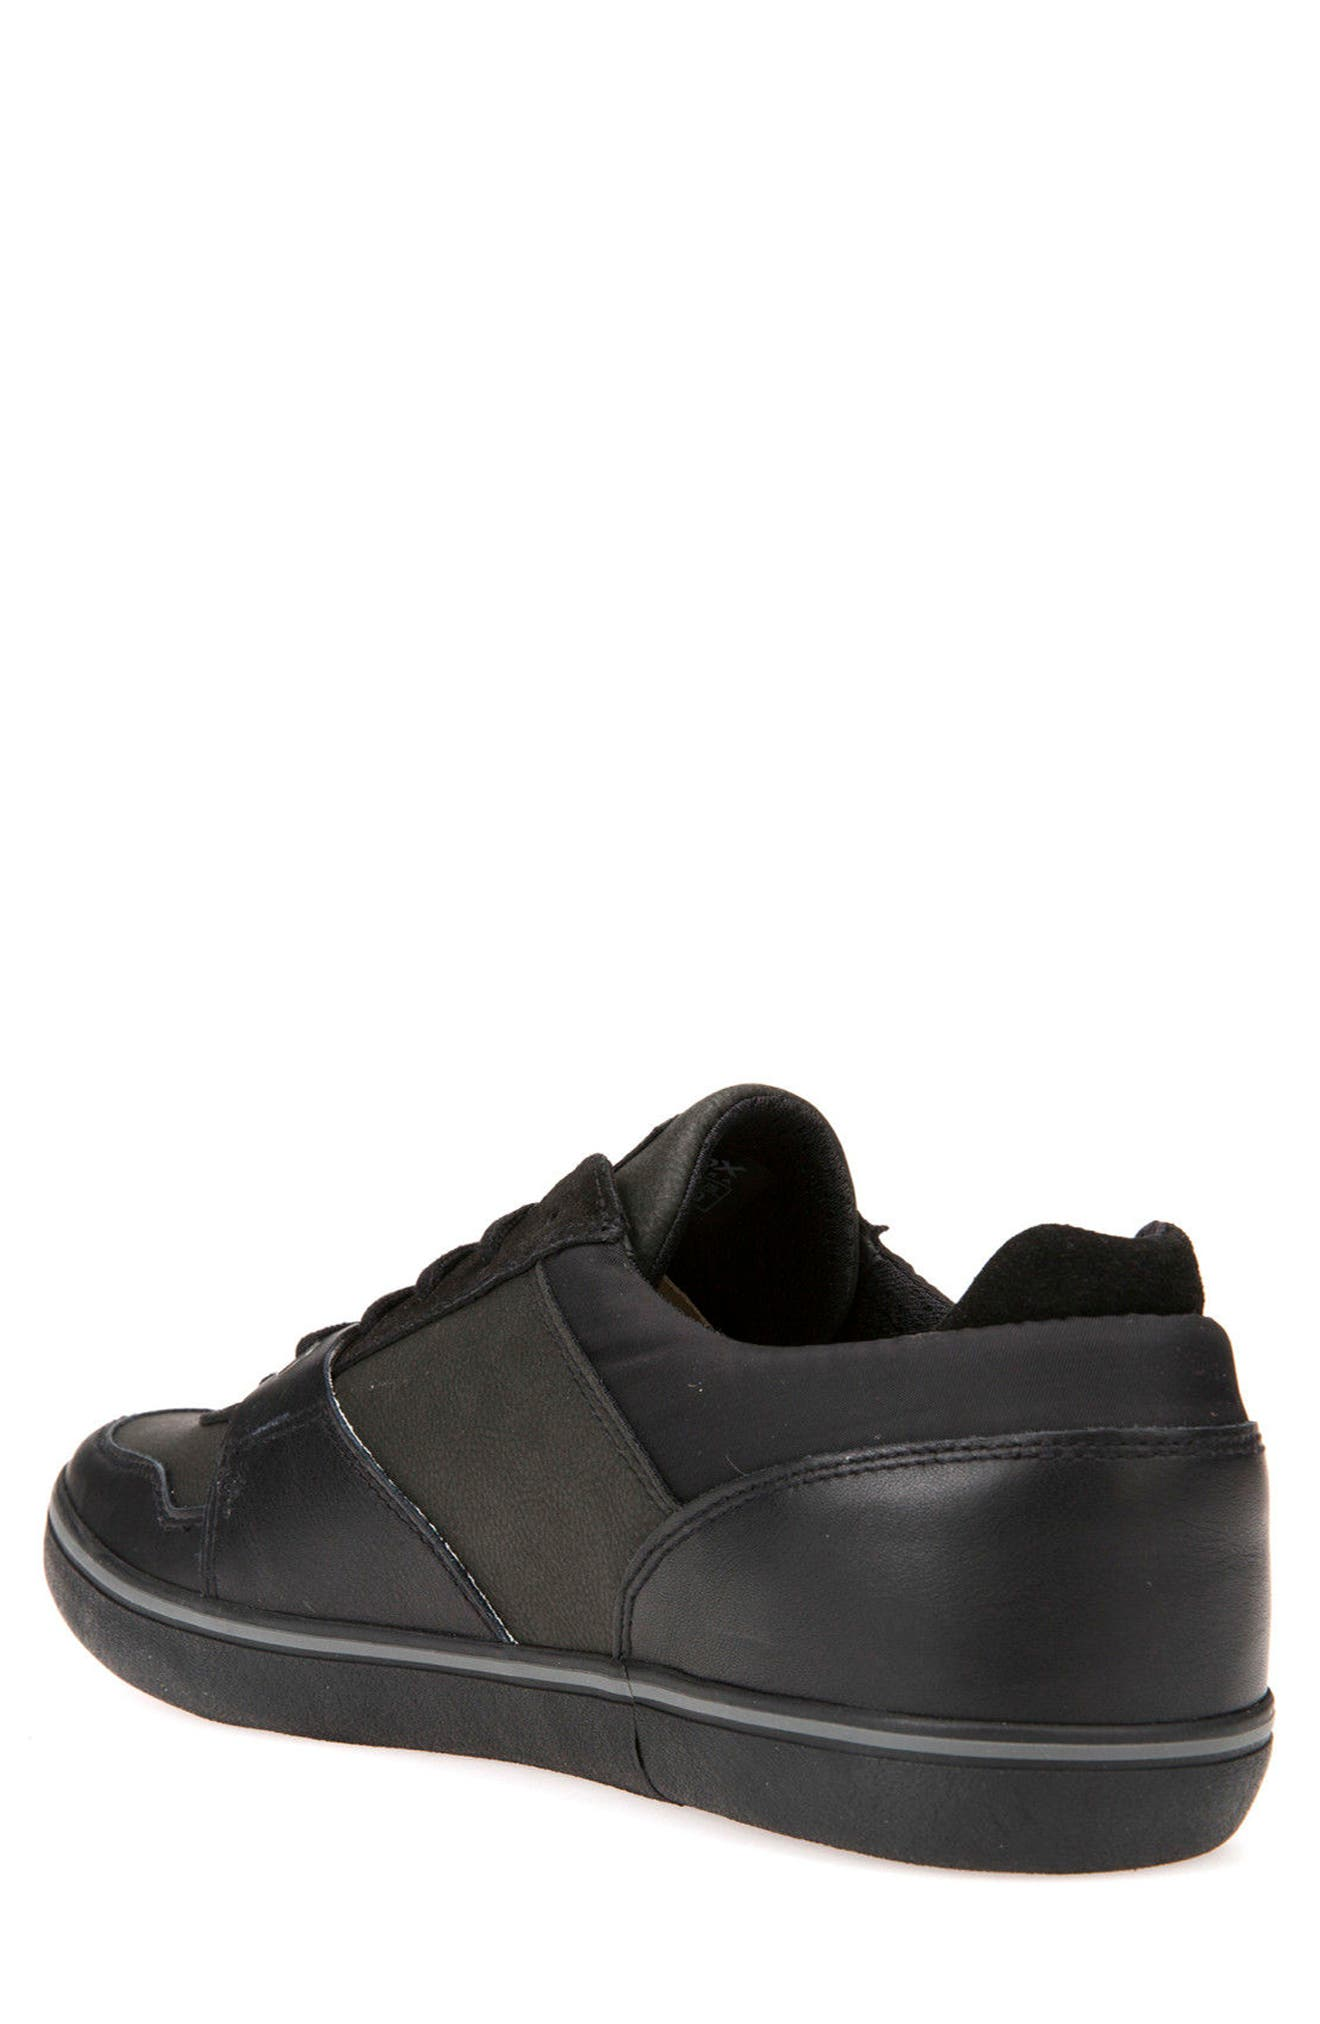 Box 28 Low-Profile Sneaker,                             Alternate thumbnail 2, color,                             BLACK